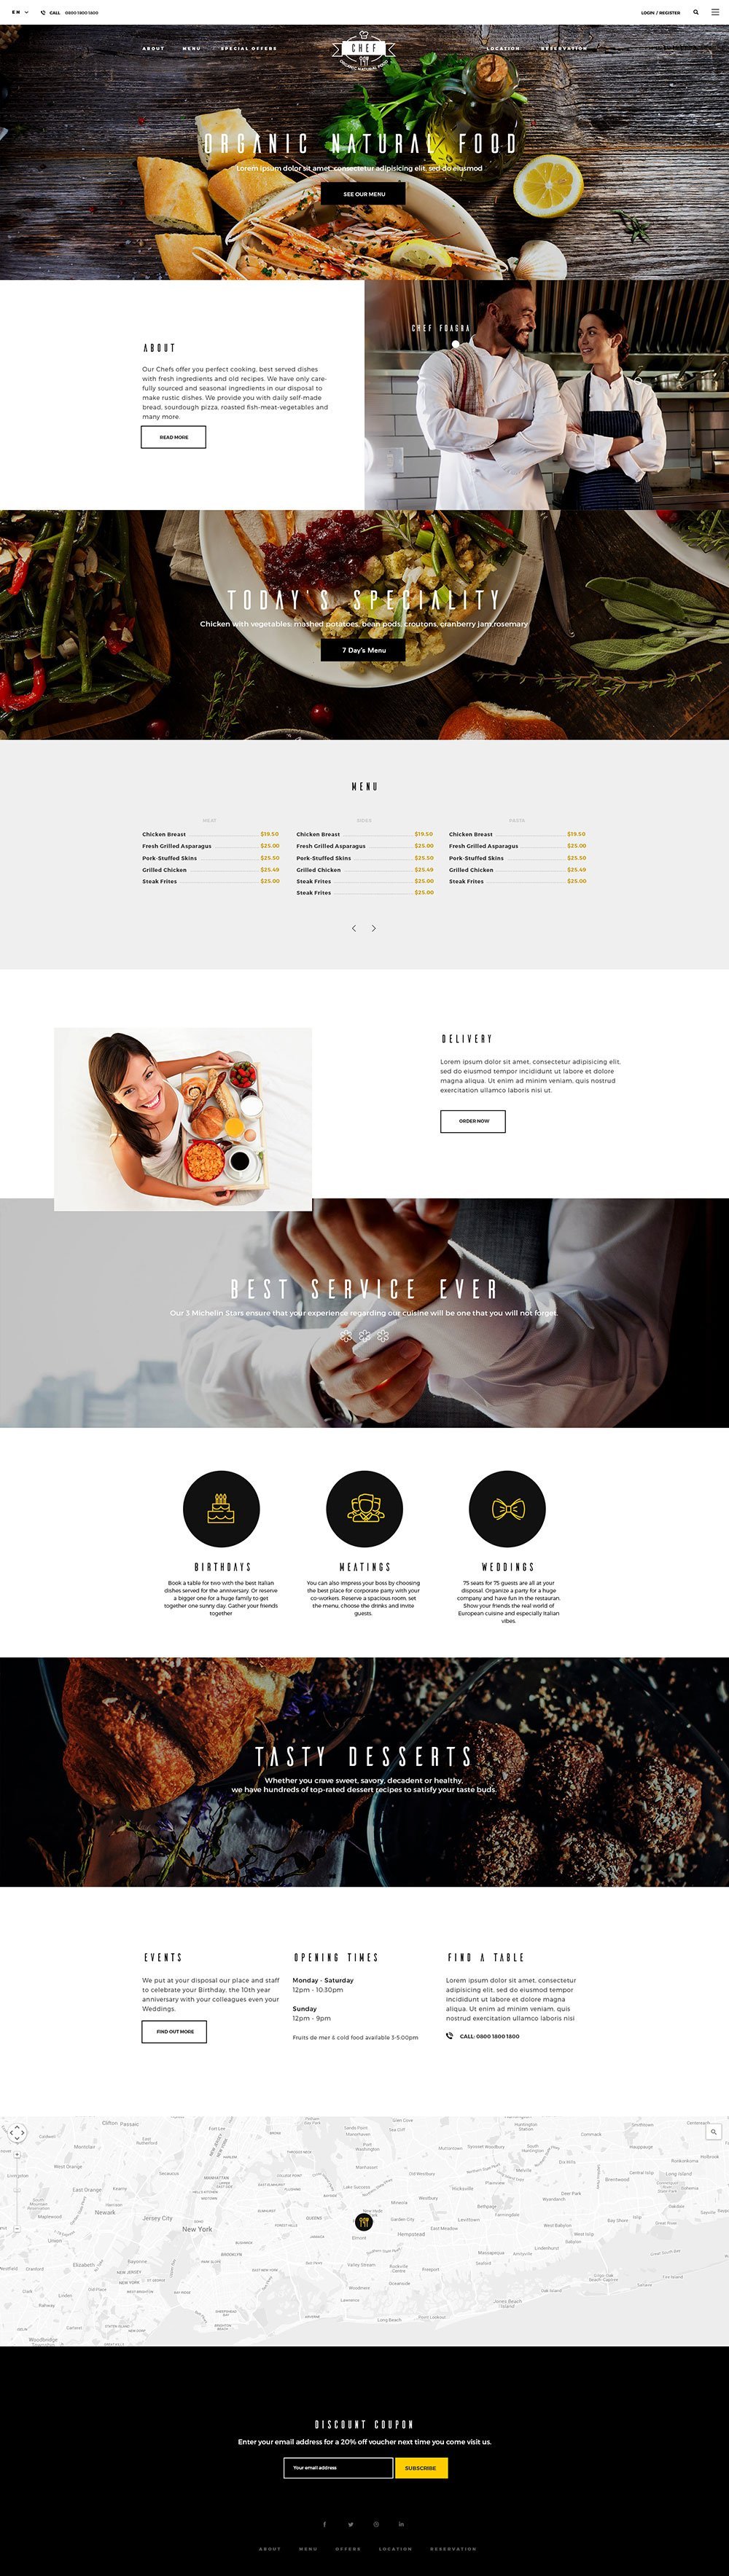 Restaurant – Free PSD Template | Hogash Studio